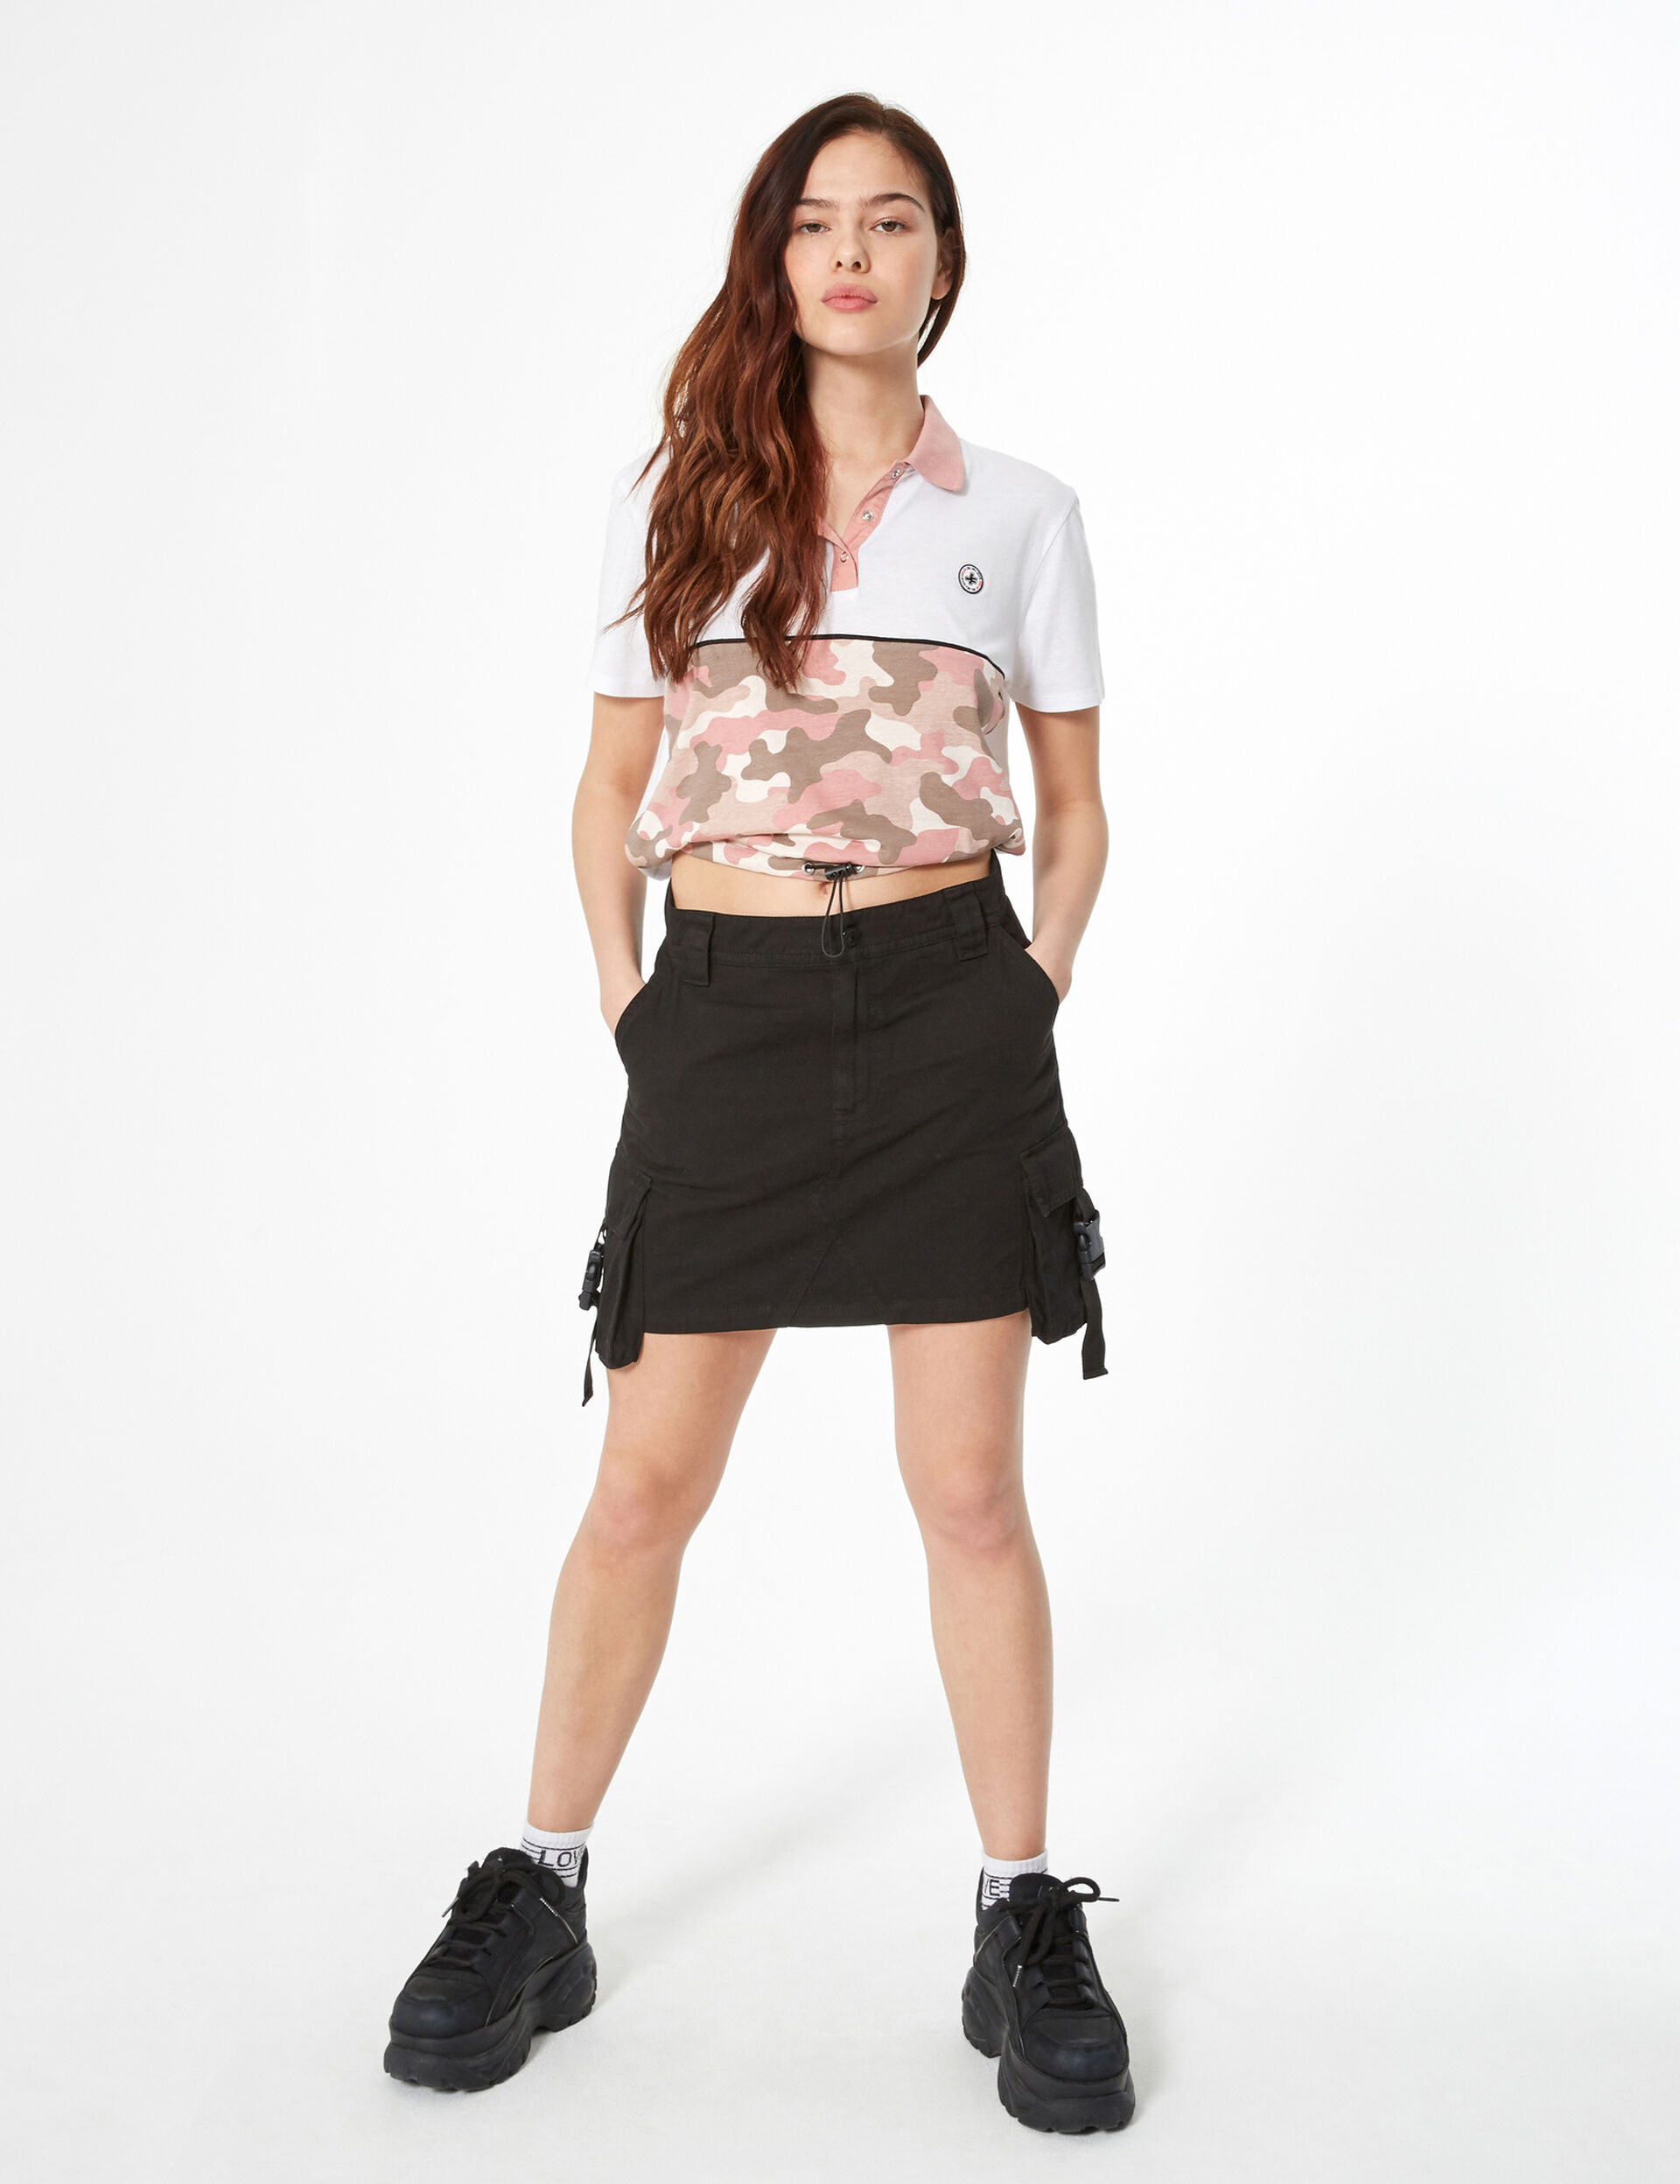 Cargo-style skirt